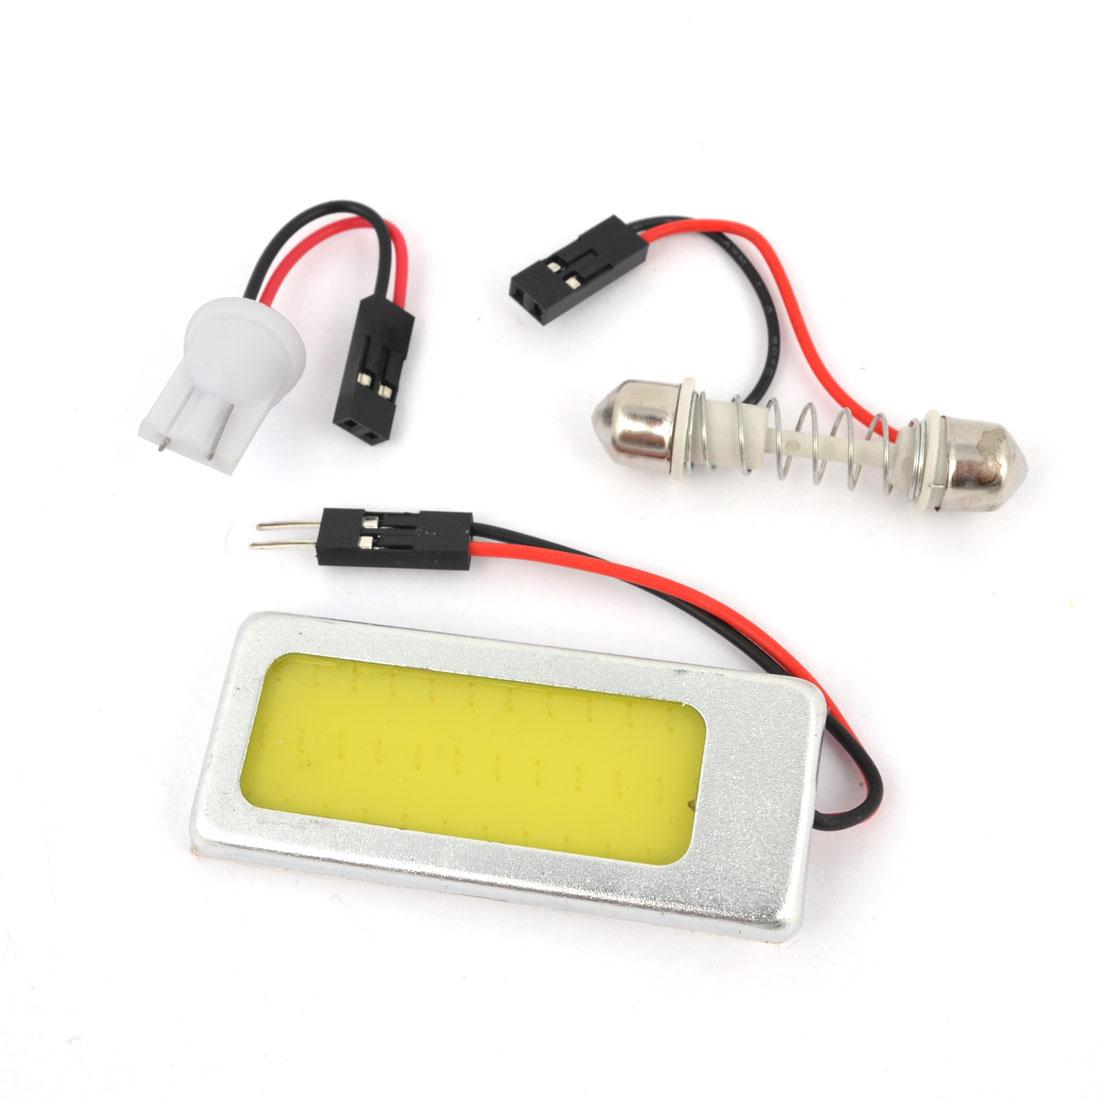 Internal Car Metal Frame White 24 COB LED Dome Lamp Panel + T10 Festoon Adapter